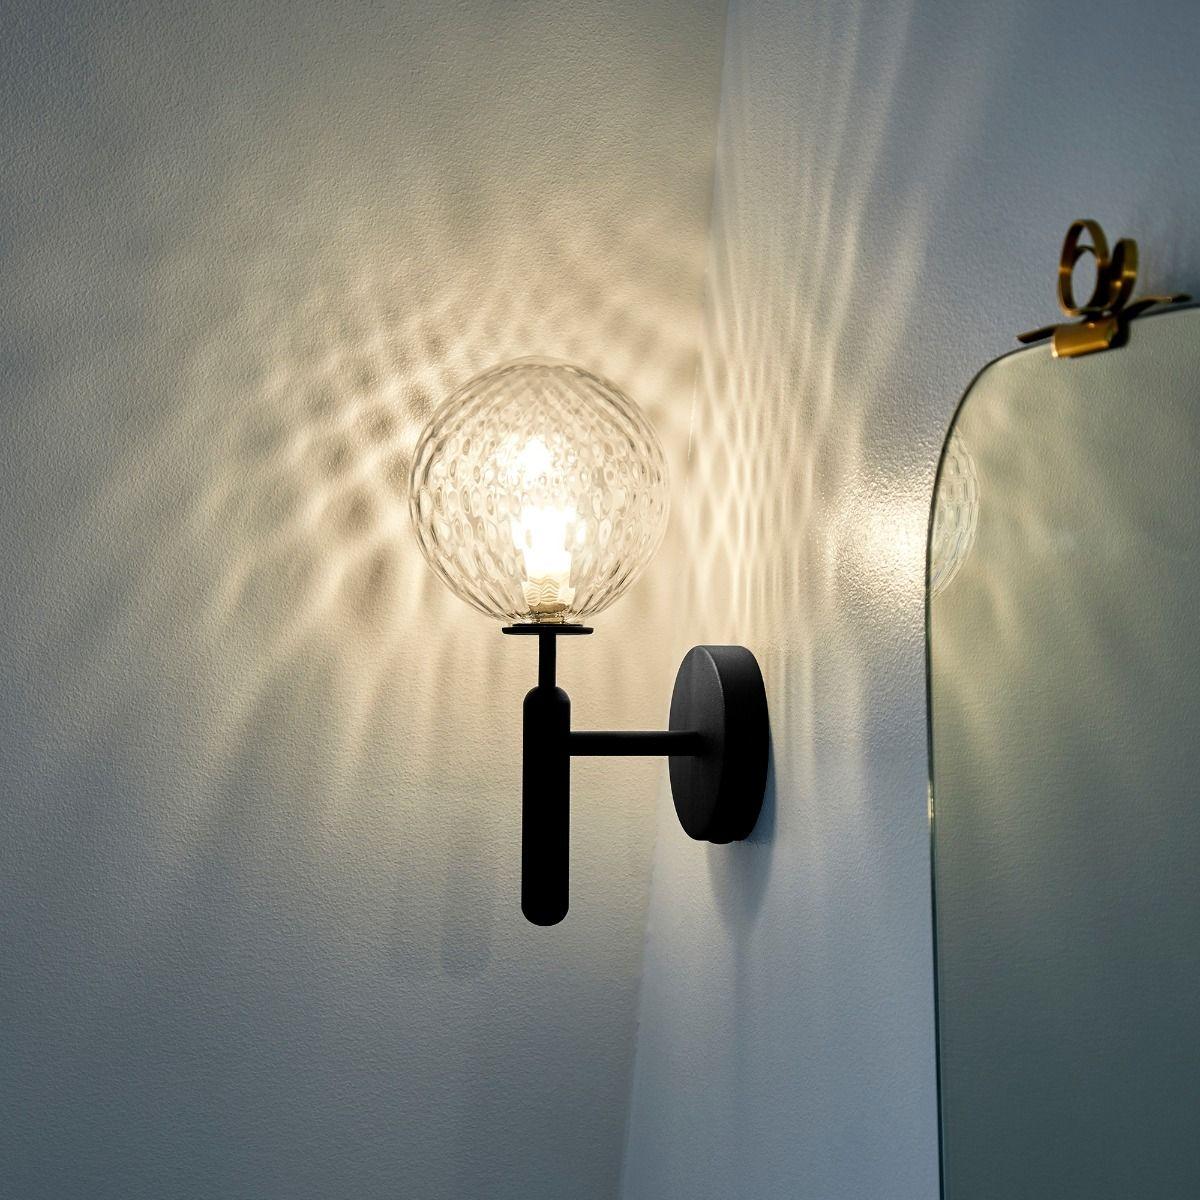 Nuura Miira Wall Light close up next to bathroom mirror